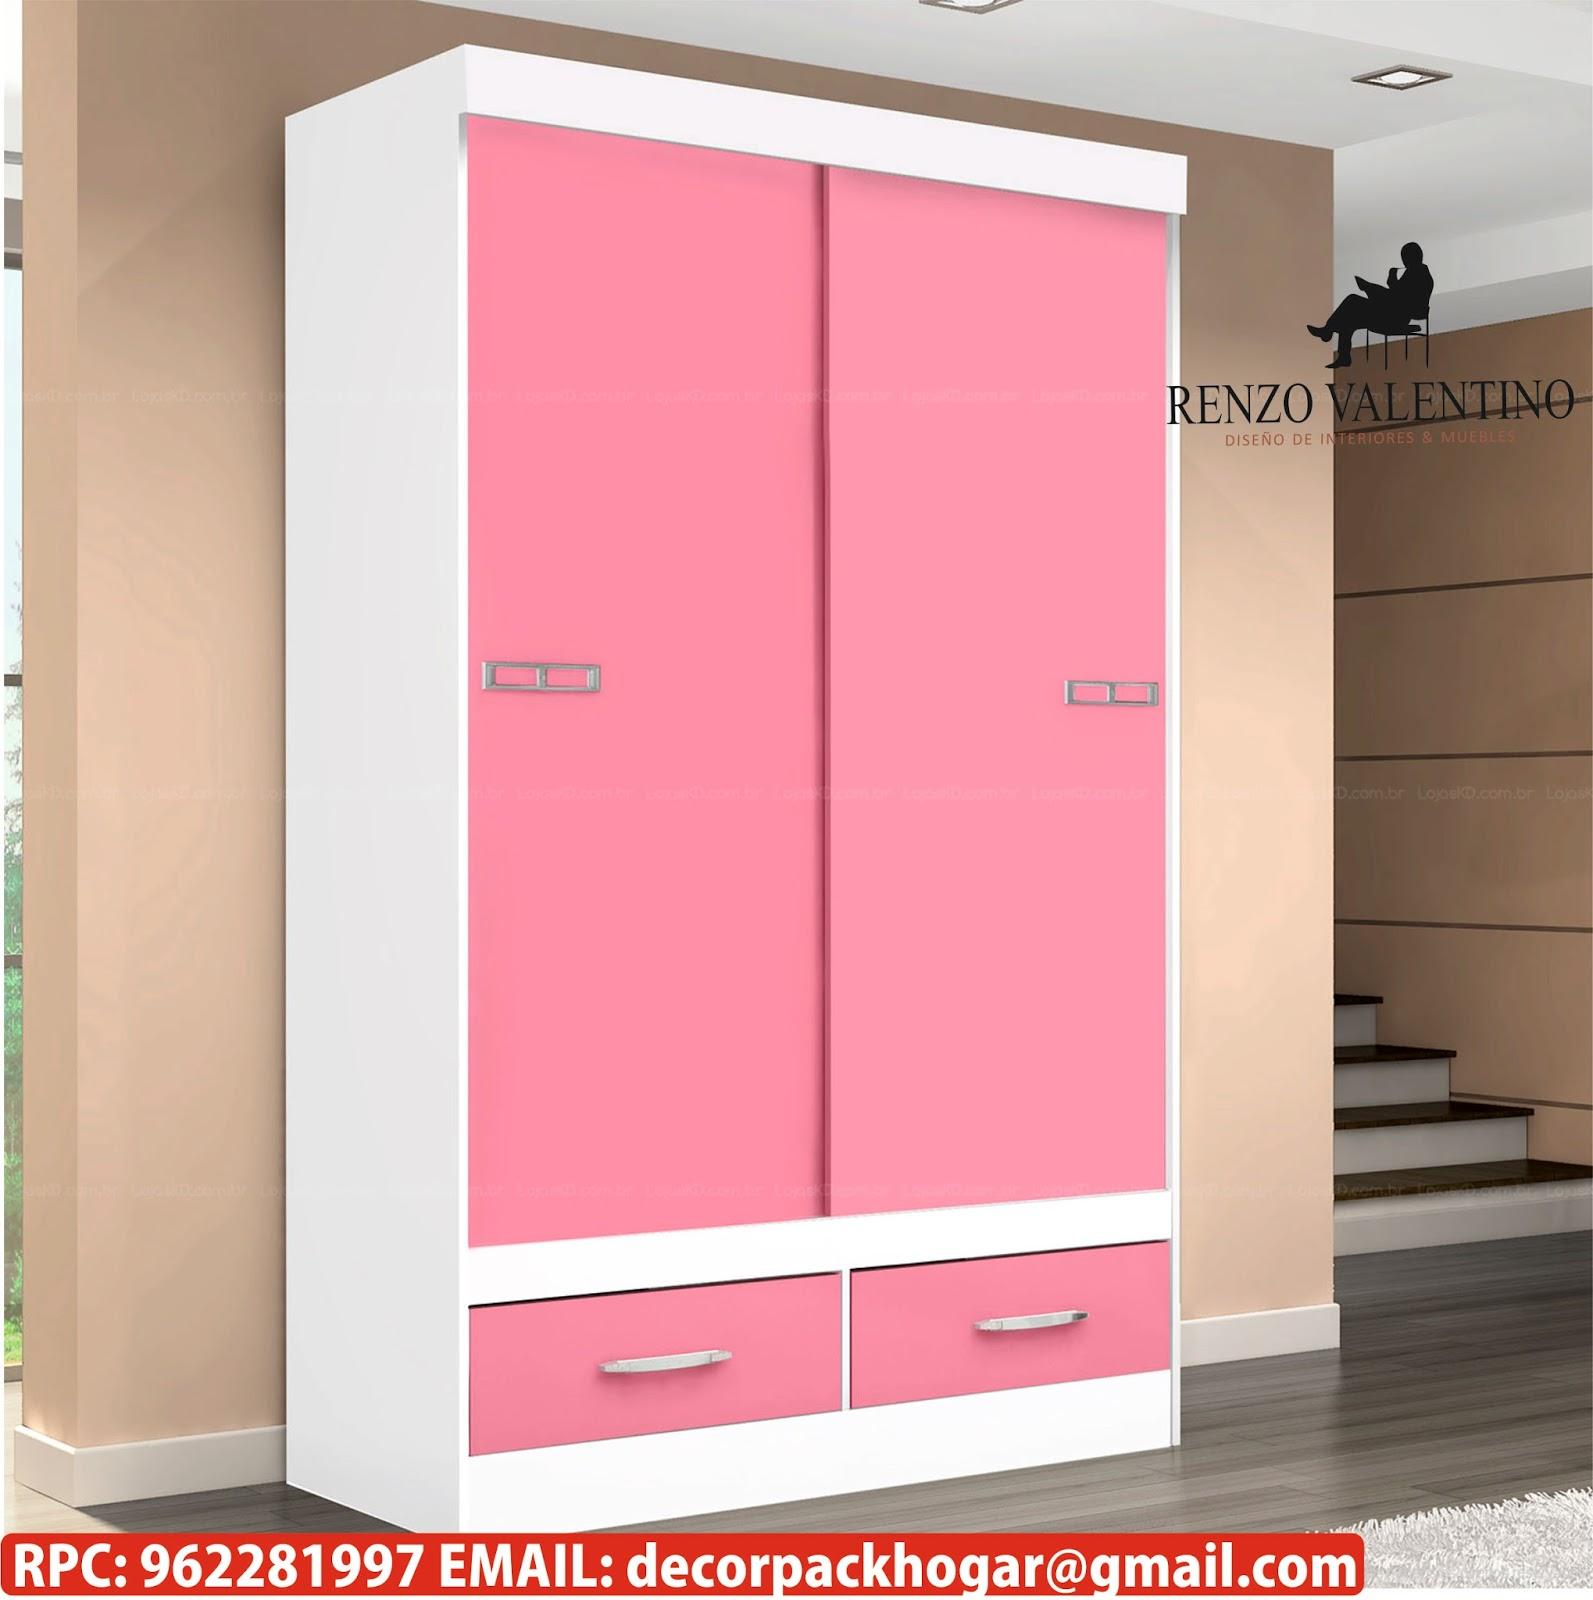 Dise os fabricacion de closet cocina y muebles de oficina for Muebles cocina 50 cm ancho